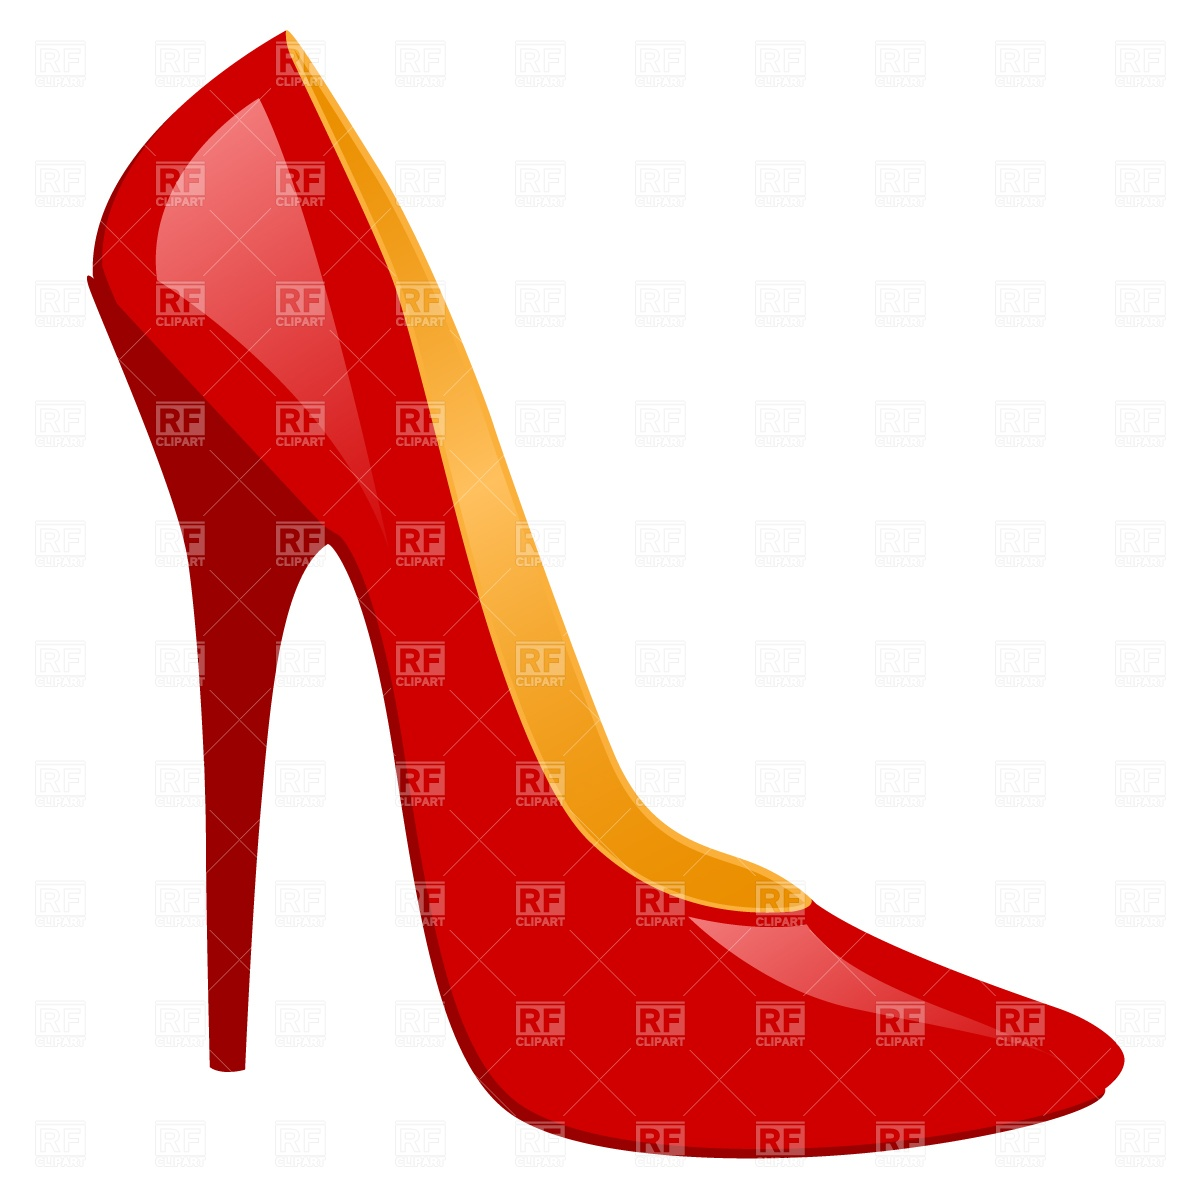 Lastest Women S Gym Shoes Clip Art At Clkercom  Vector Clip Art Online